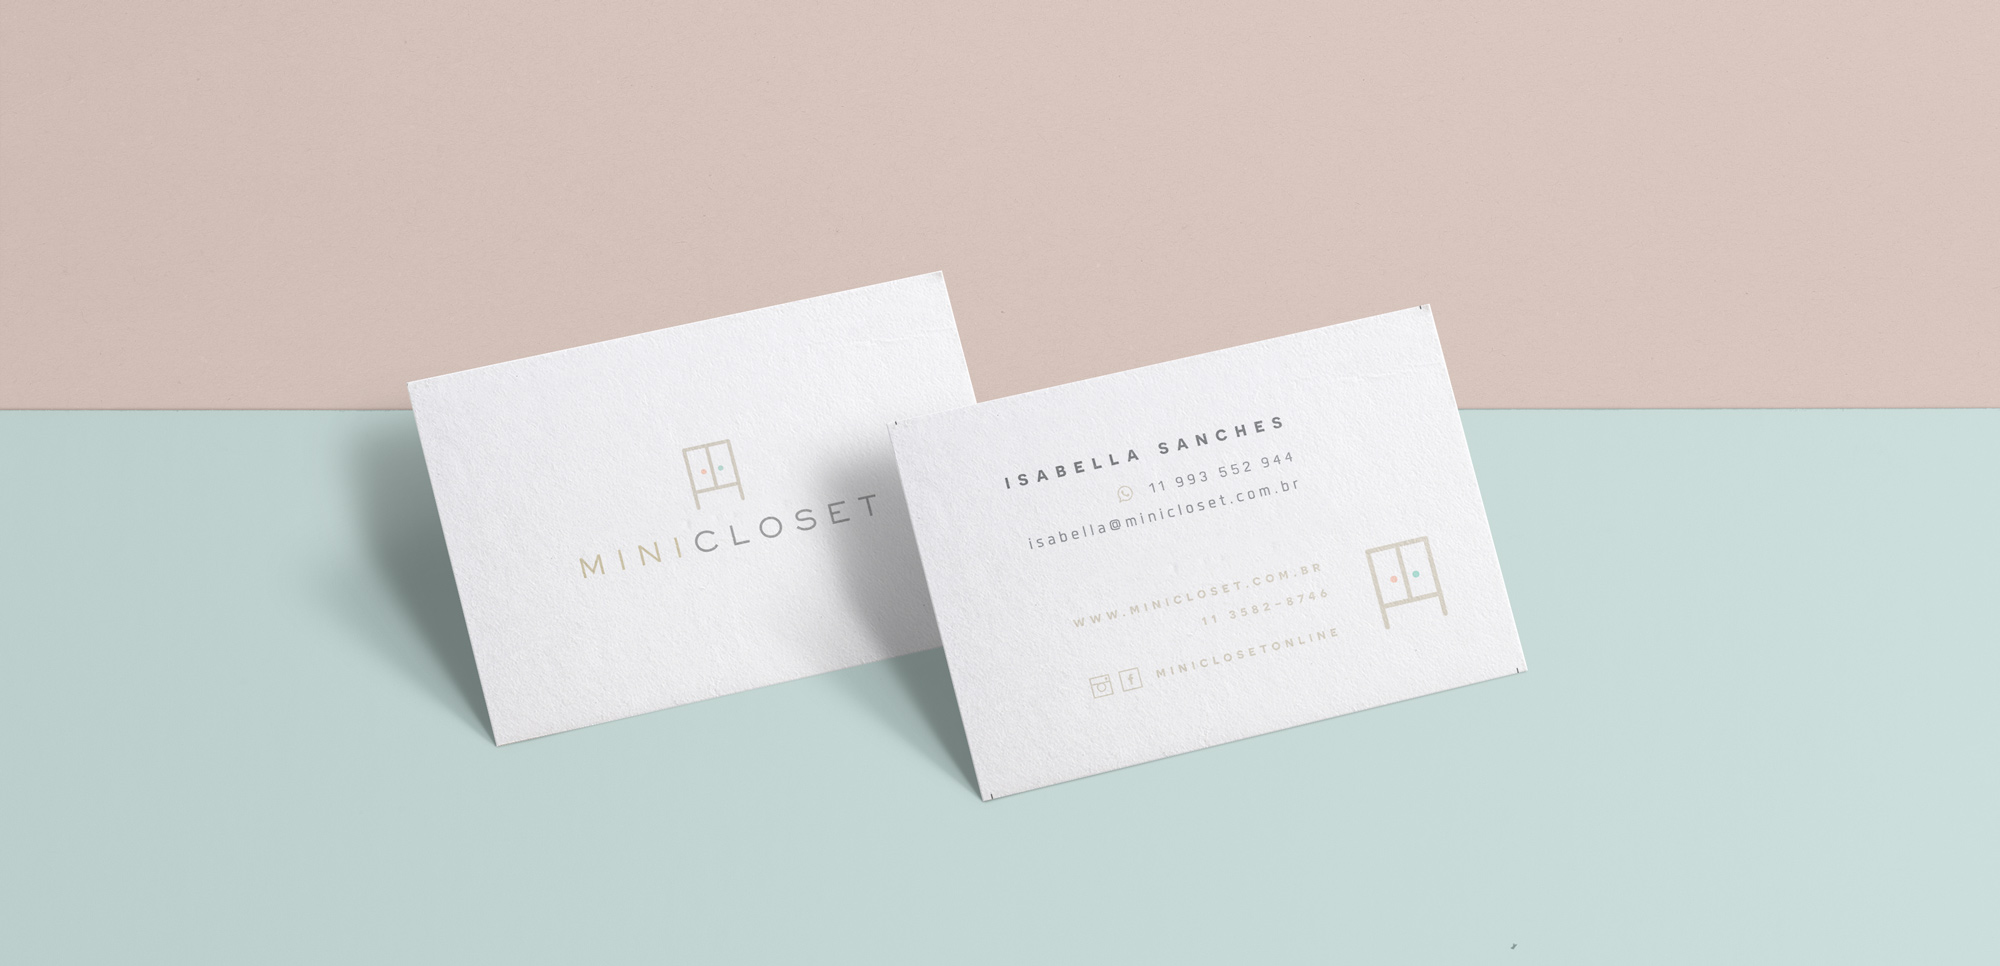 daniel-zito-mini-closet-cartao-design-grafico.jpg